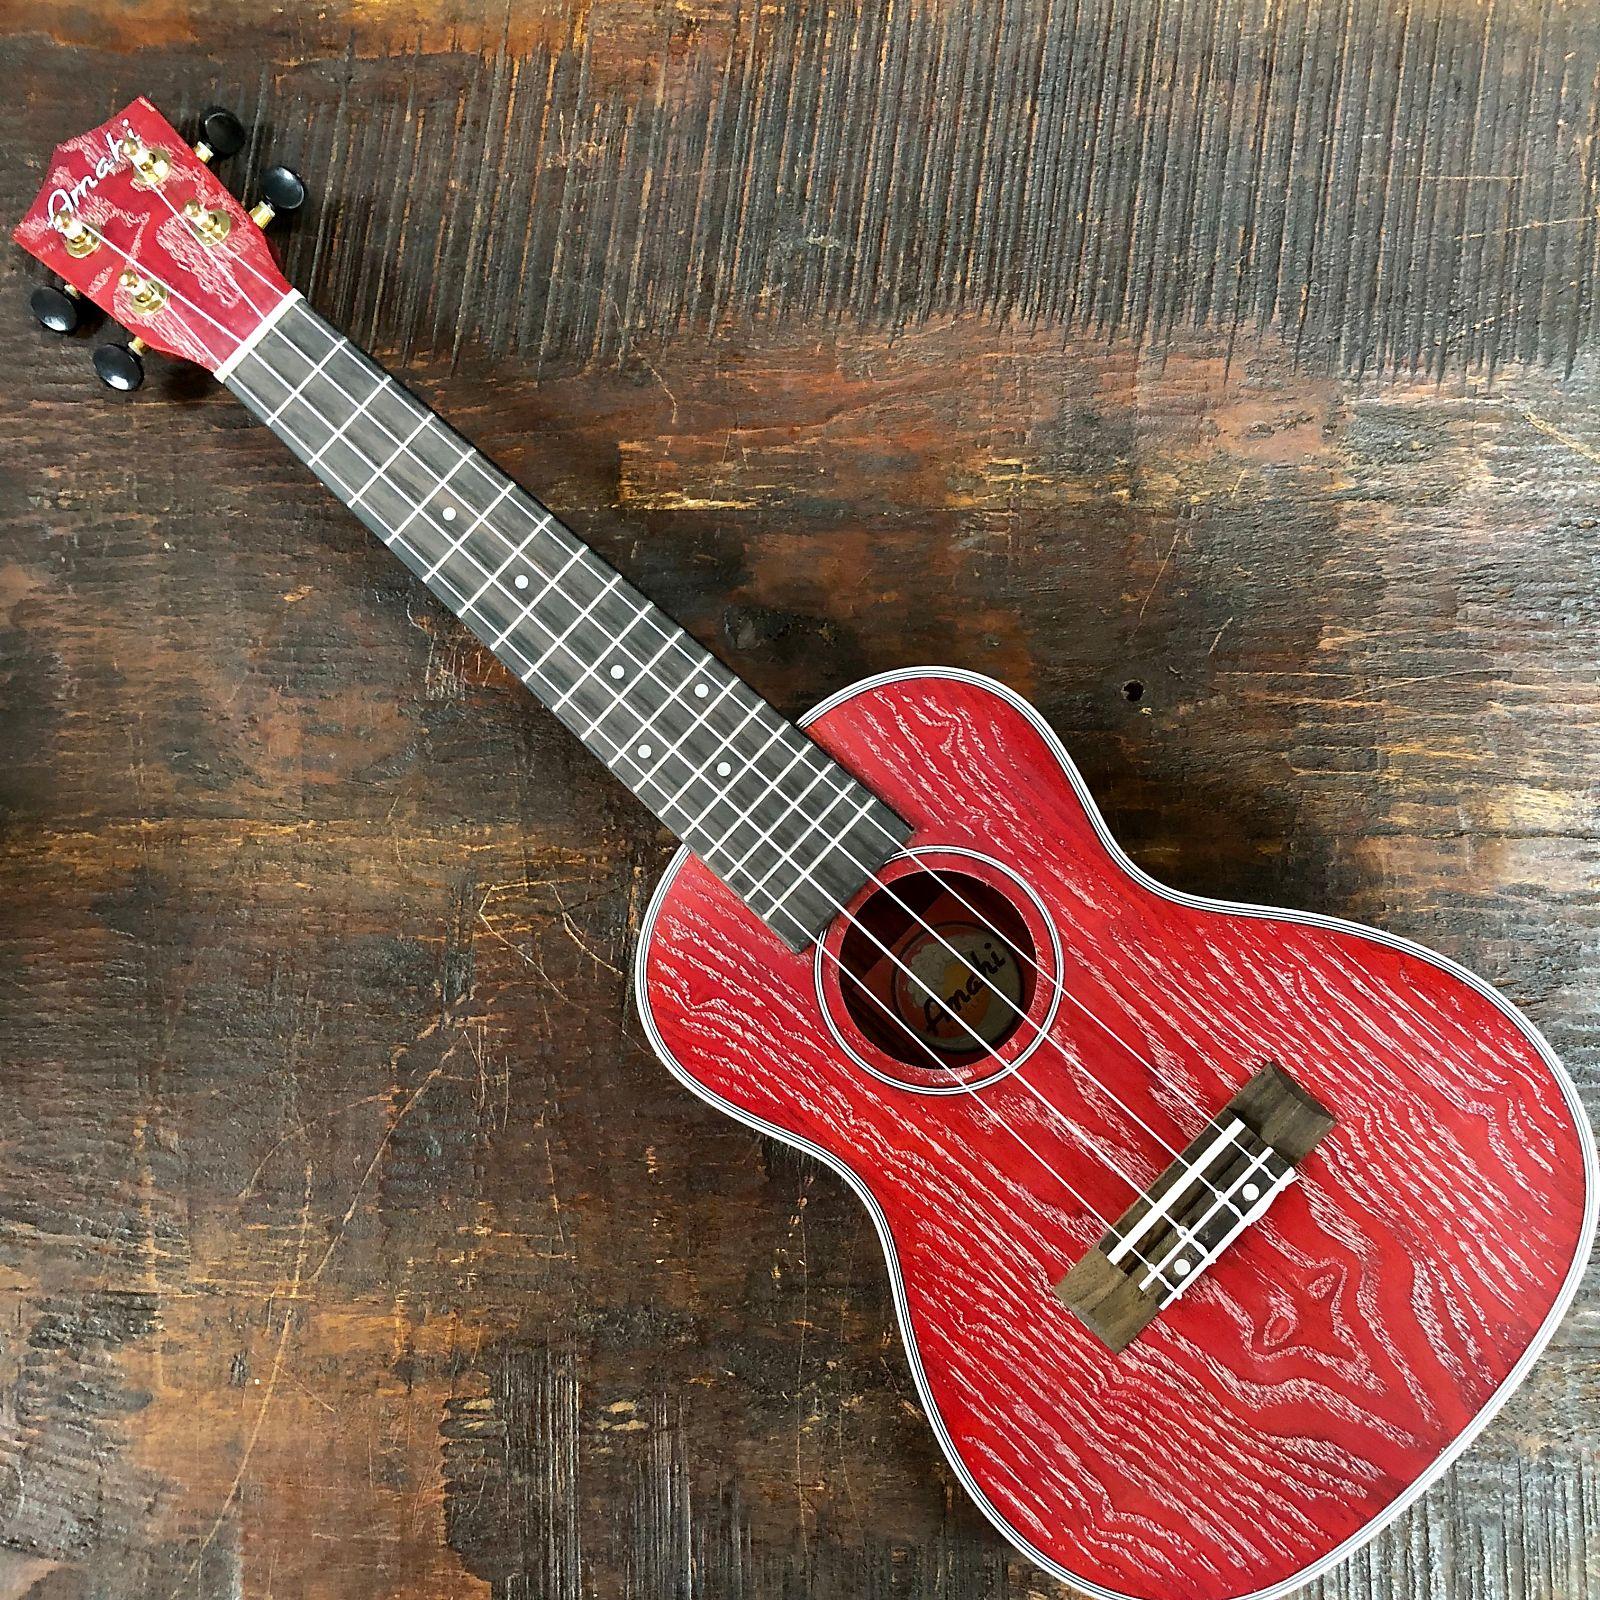 Amahi Classic Quilted Ash C-22 Red Concert Ukulele